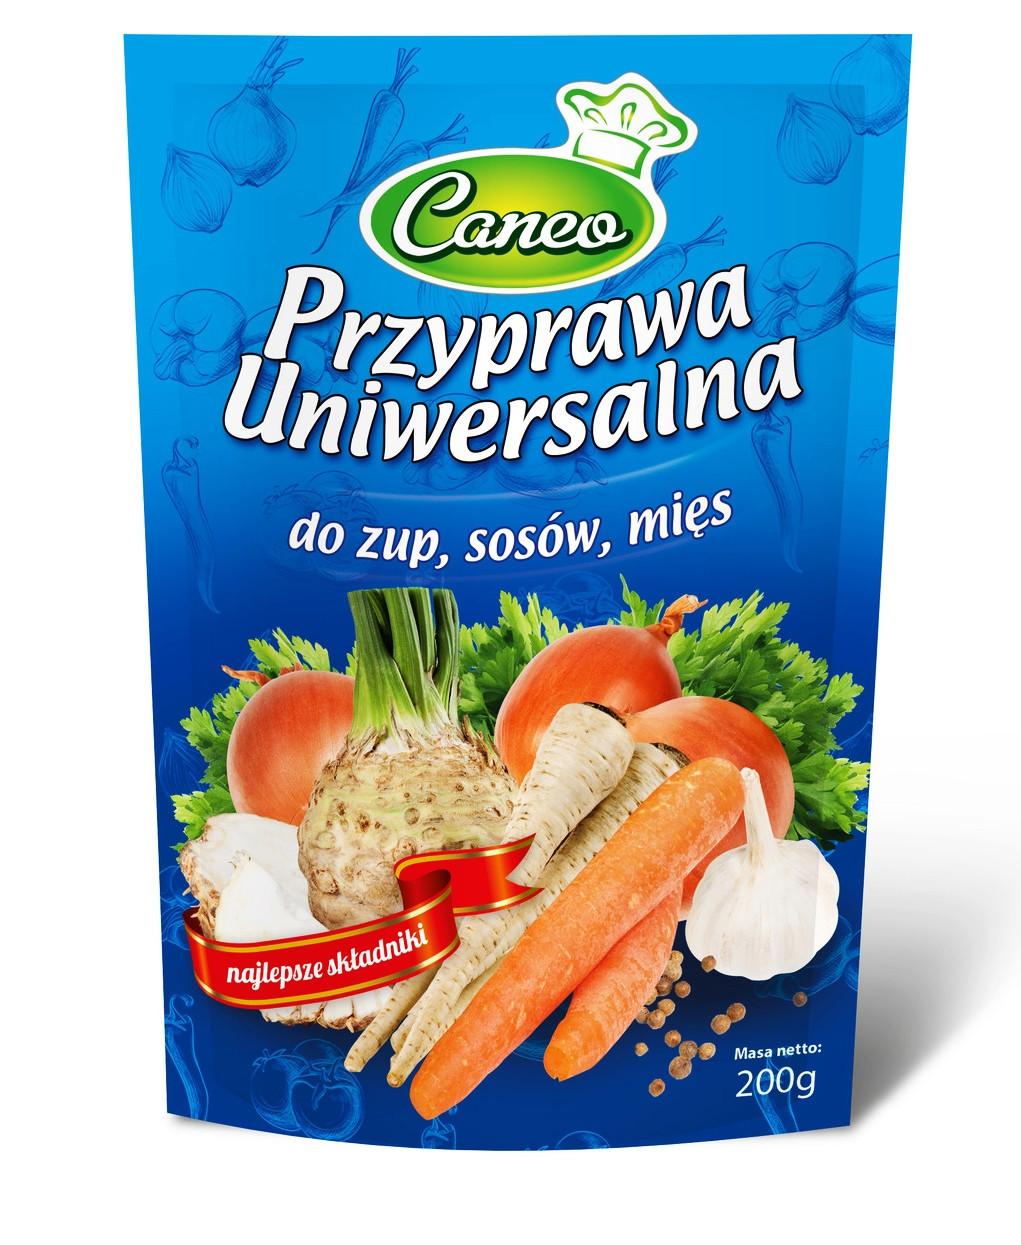 Приправа універсальна Caneo, 200г Польща